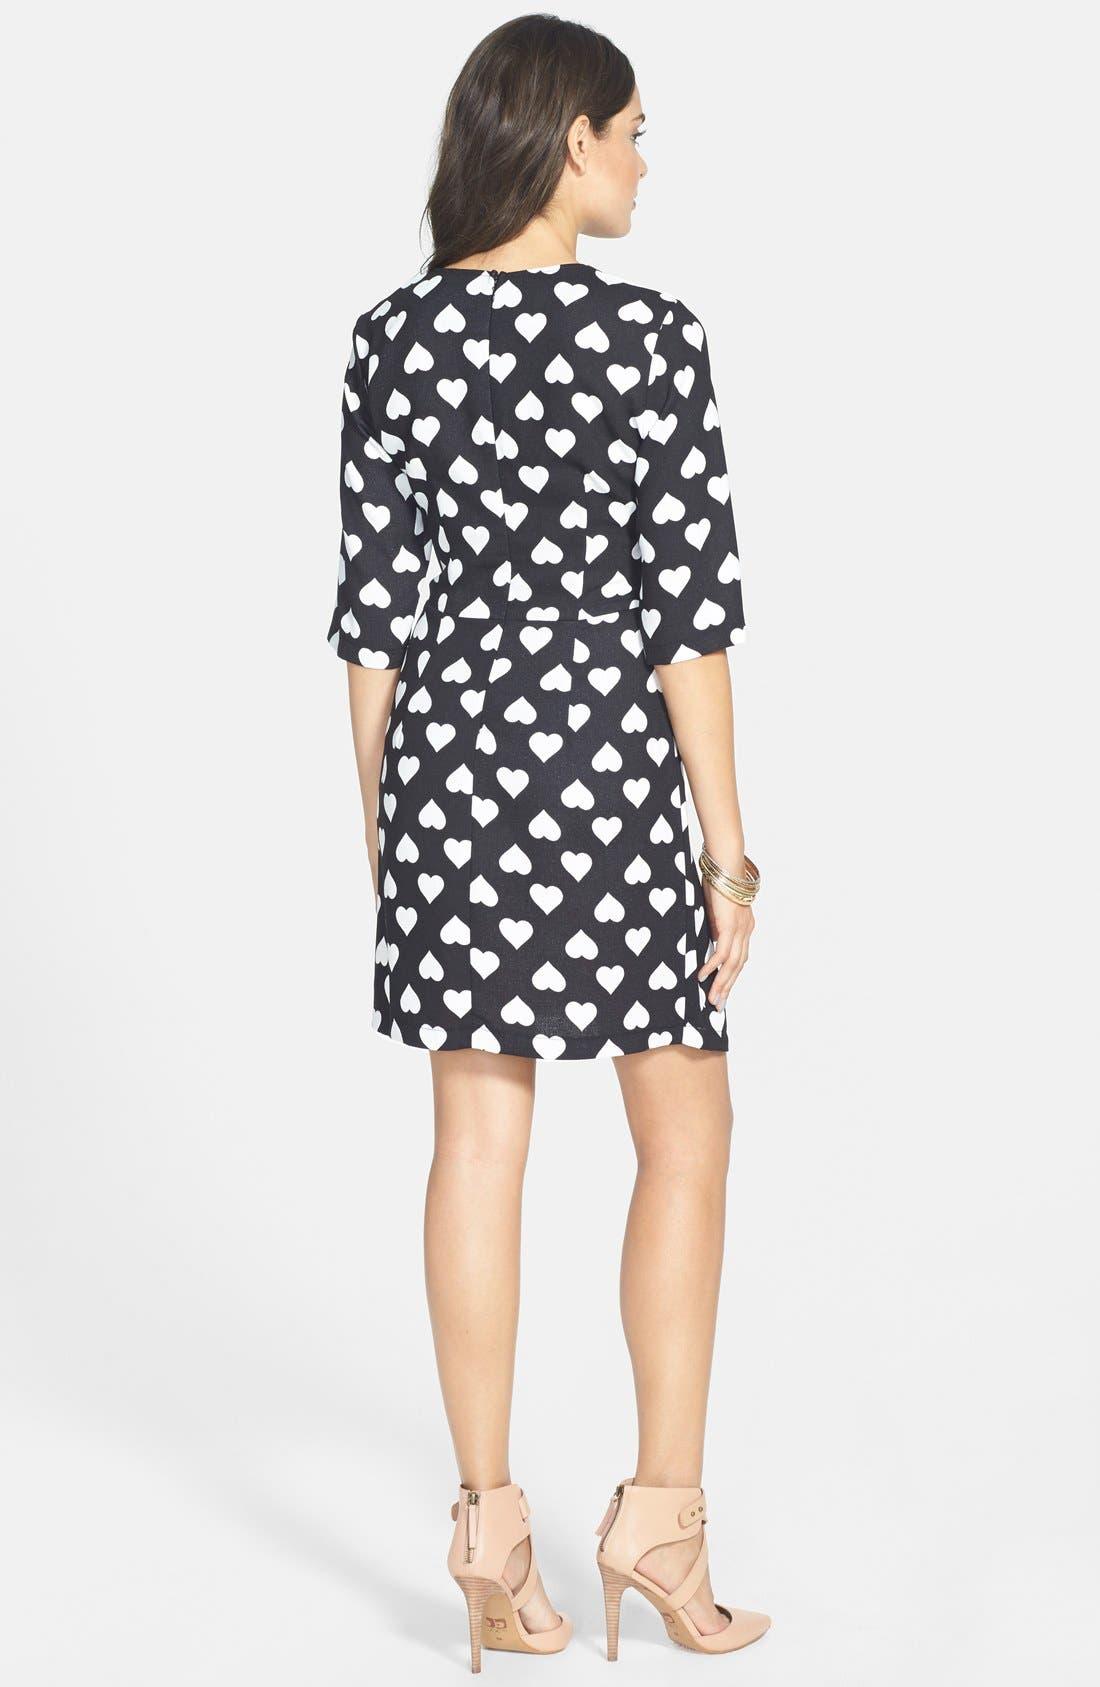 POPPY LUX, 'Nancy' Heart Print Asymmetrical Dress, Alternate thumbnail 2, color, 001